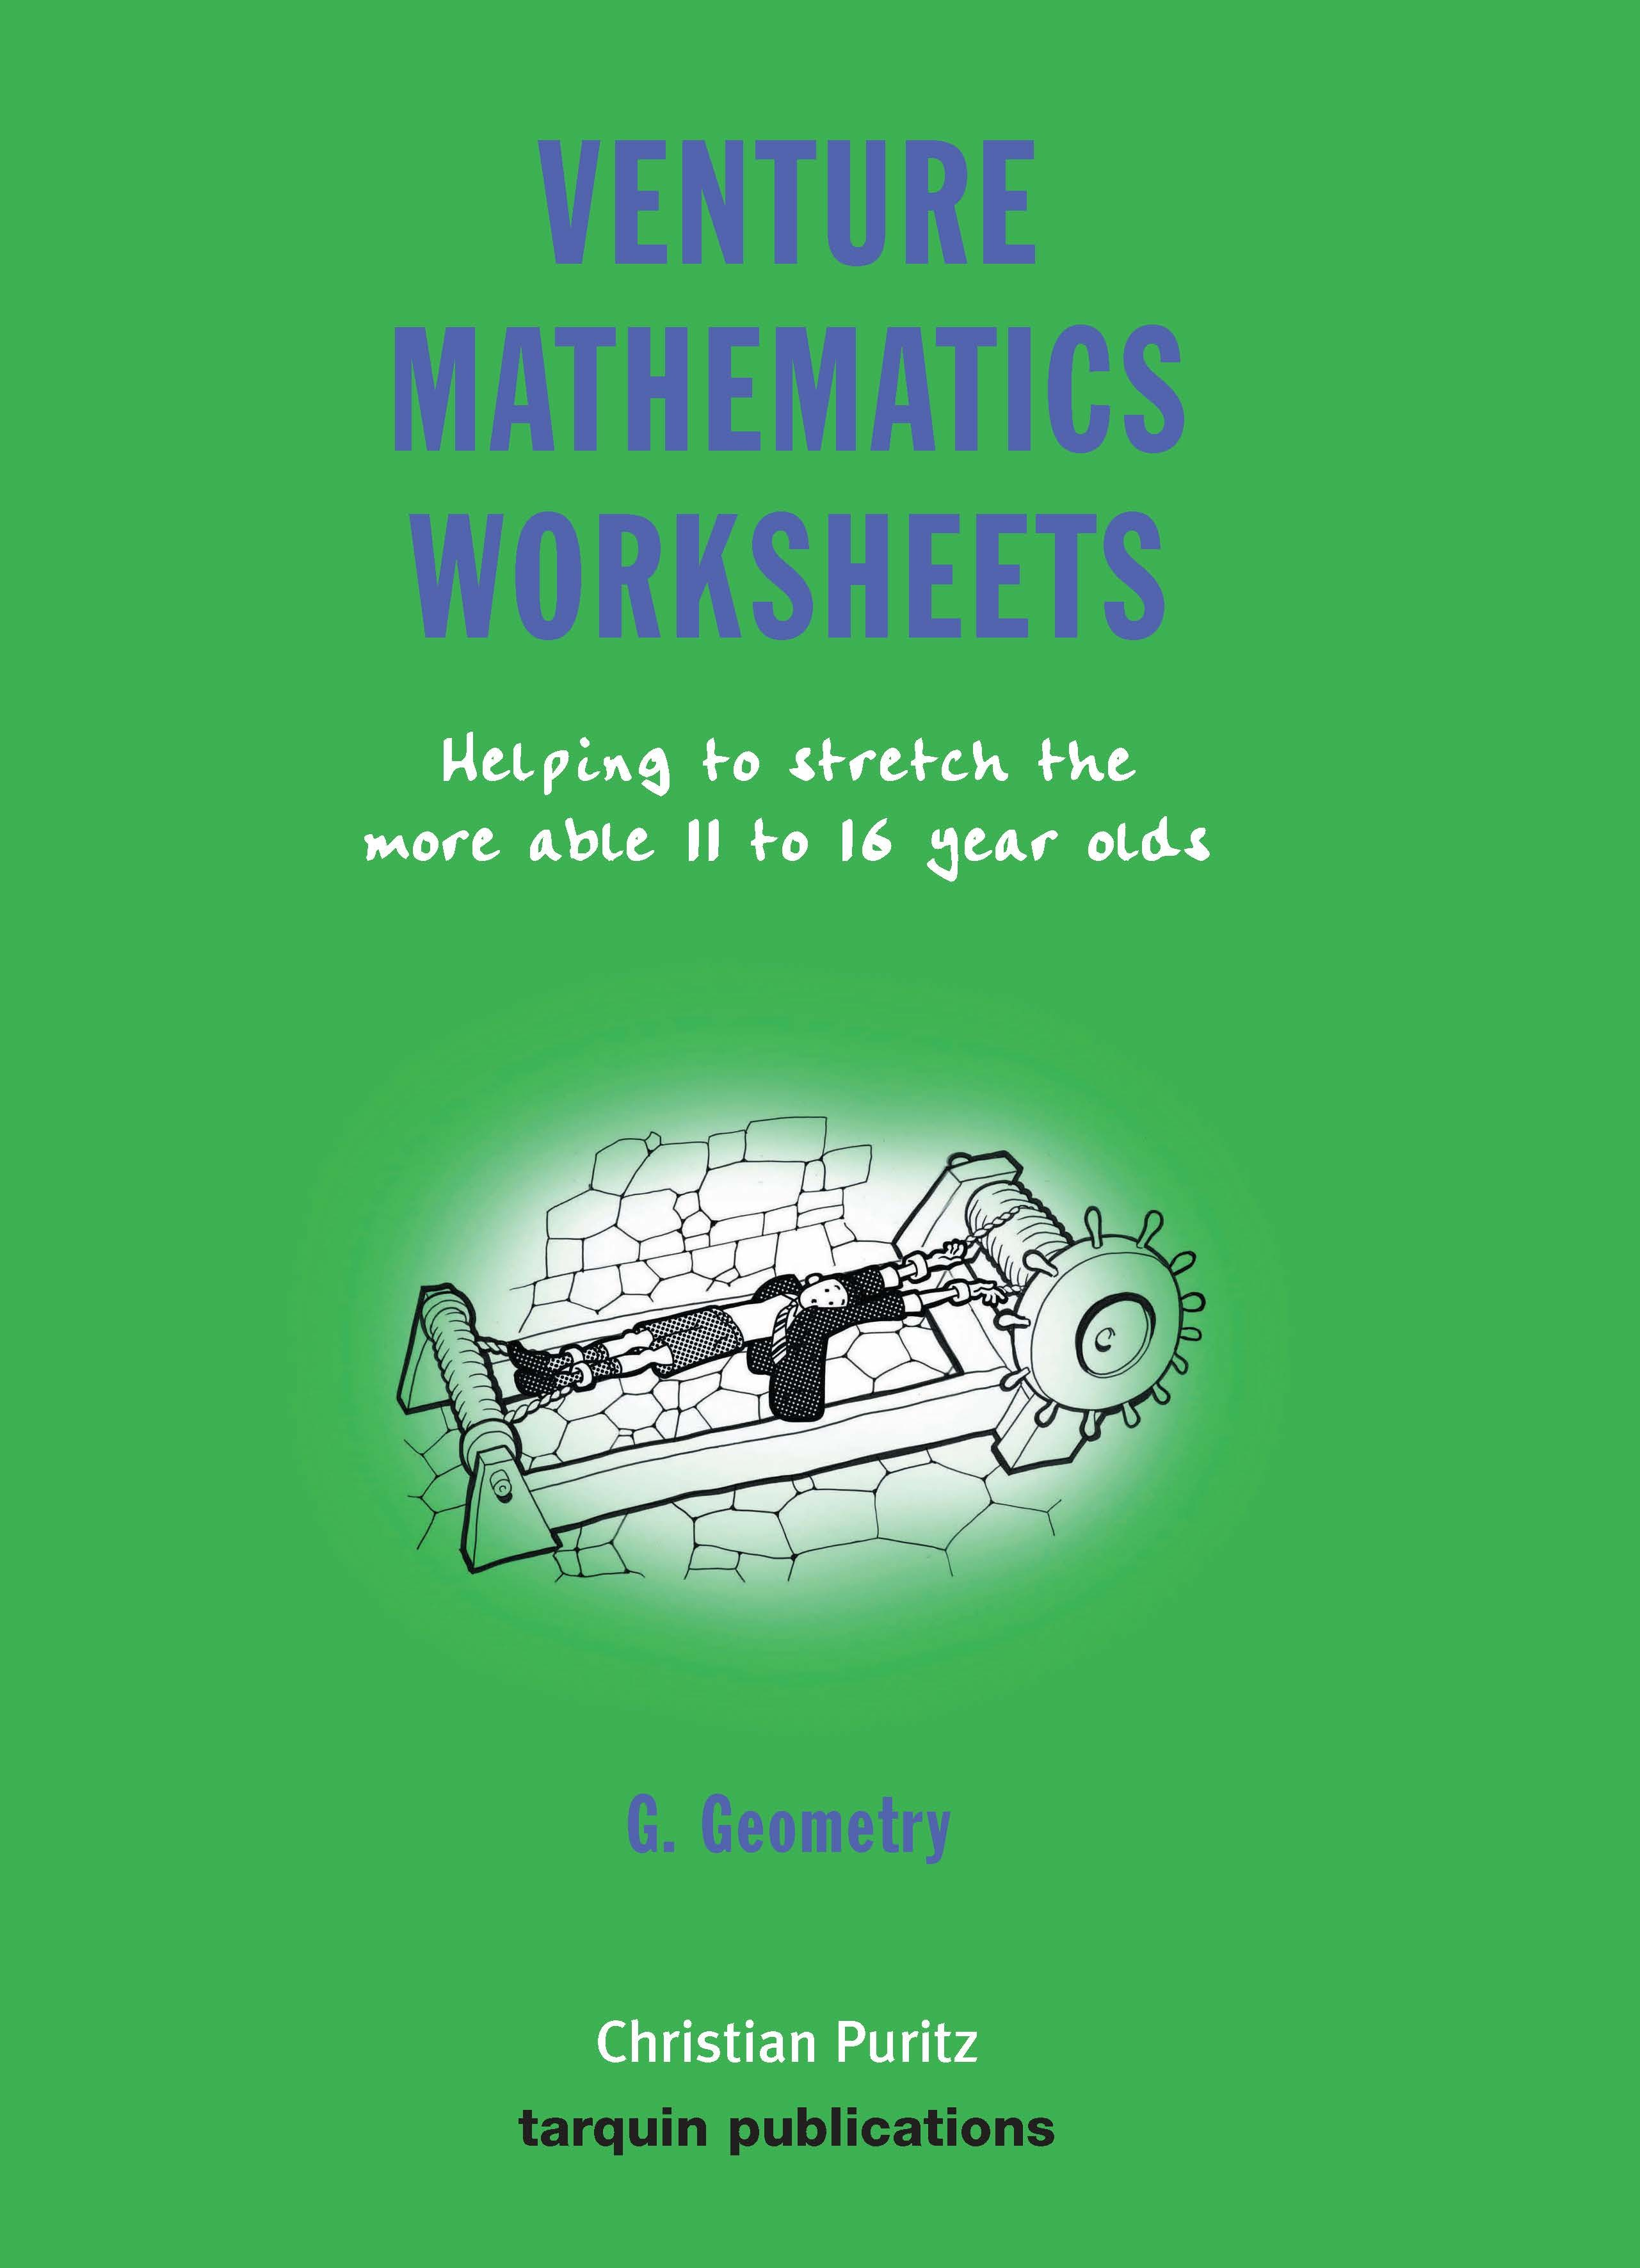 Venture Mathematics Worksheets Geometry Bk G